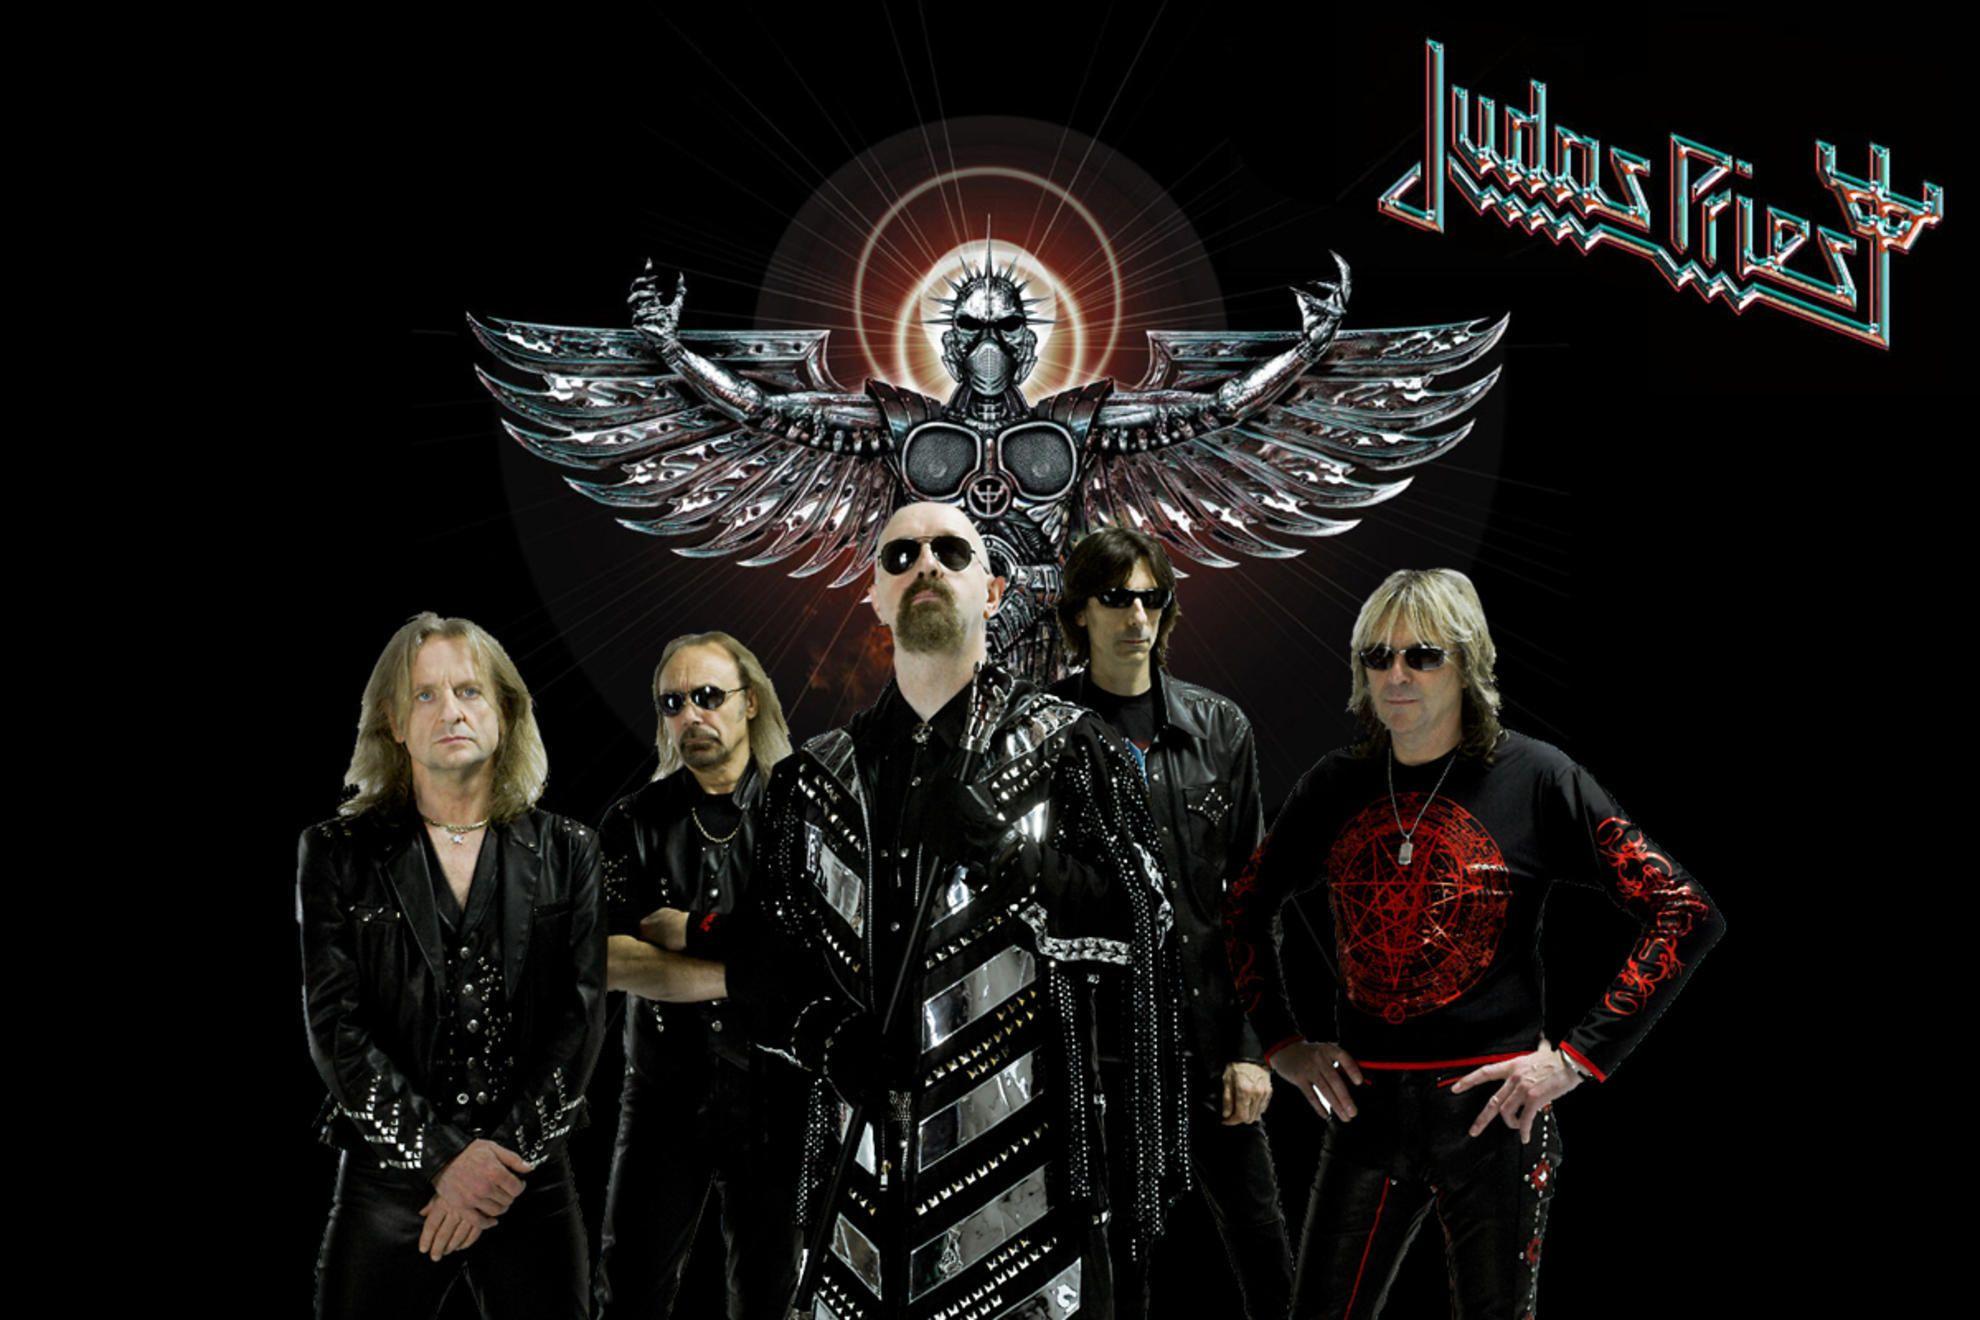 Bildresultat För Judas Priest Wallpaper Judas Priest Pinterest